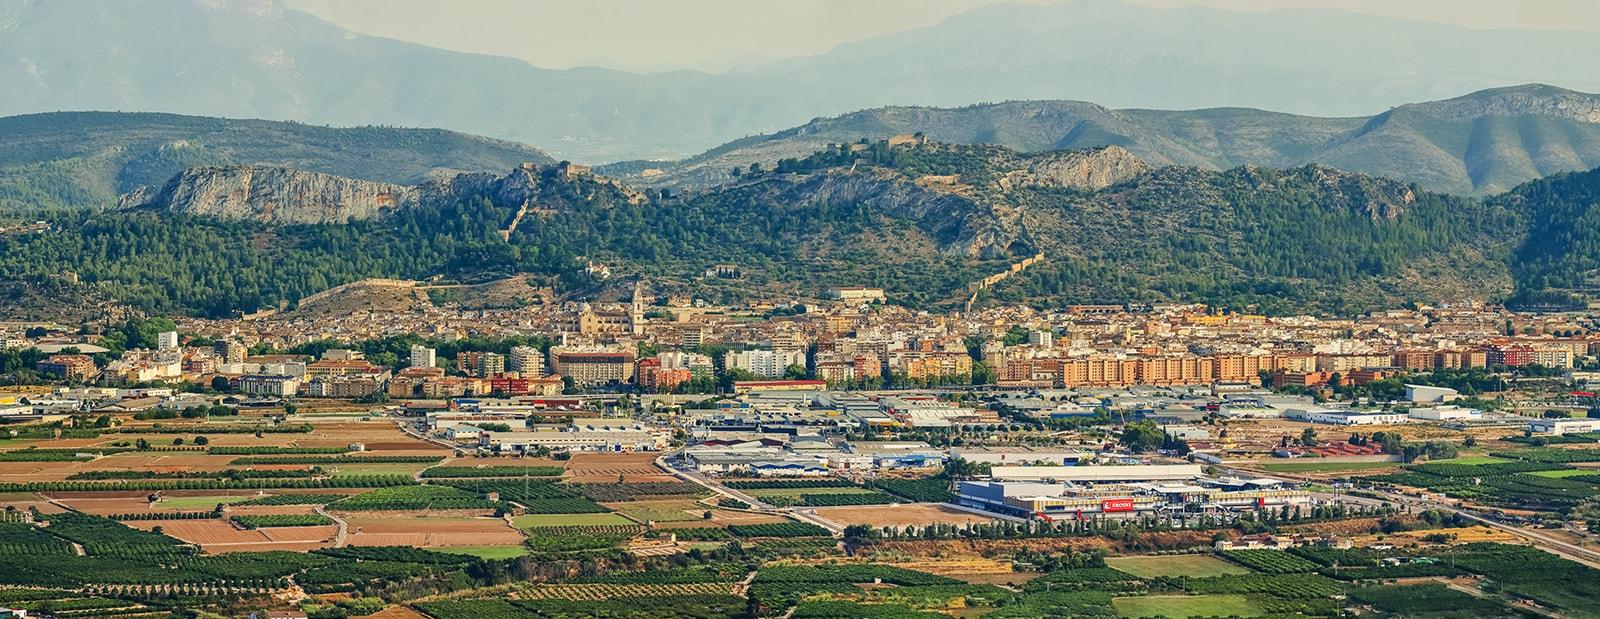 Xàtiva - Paisajes Turísticos ValencianosPaisajes